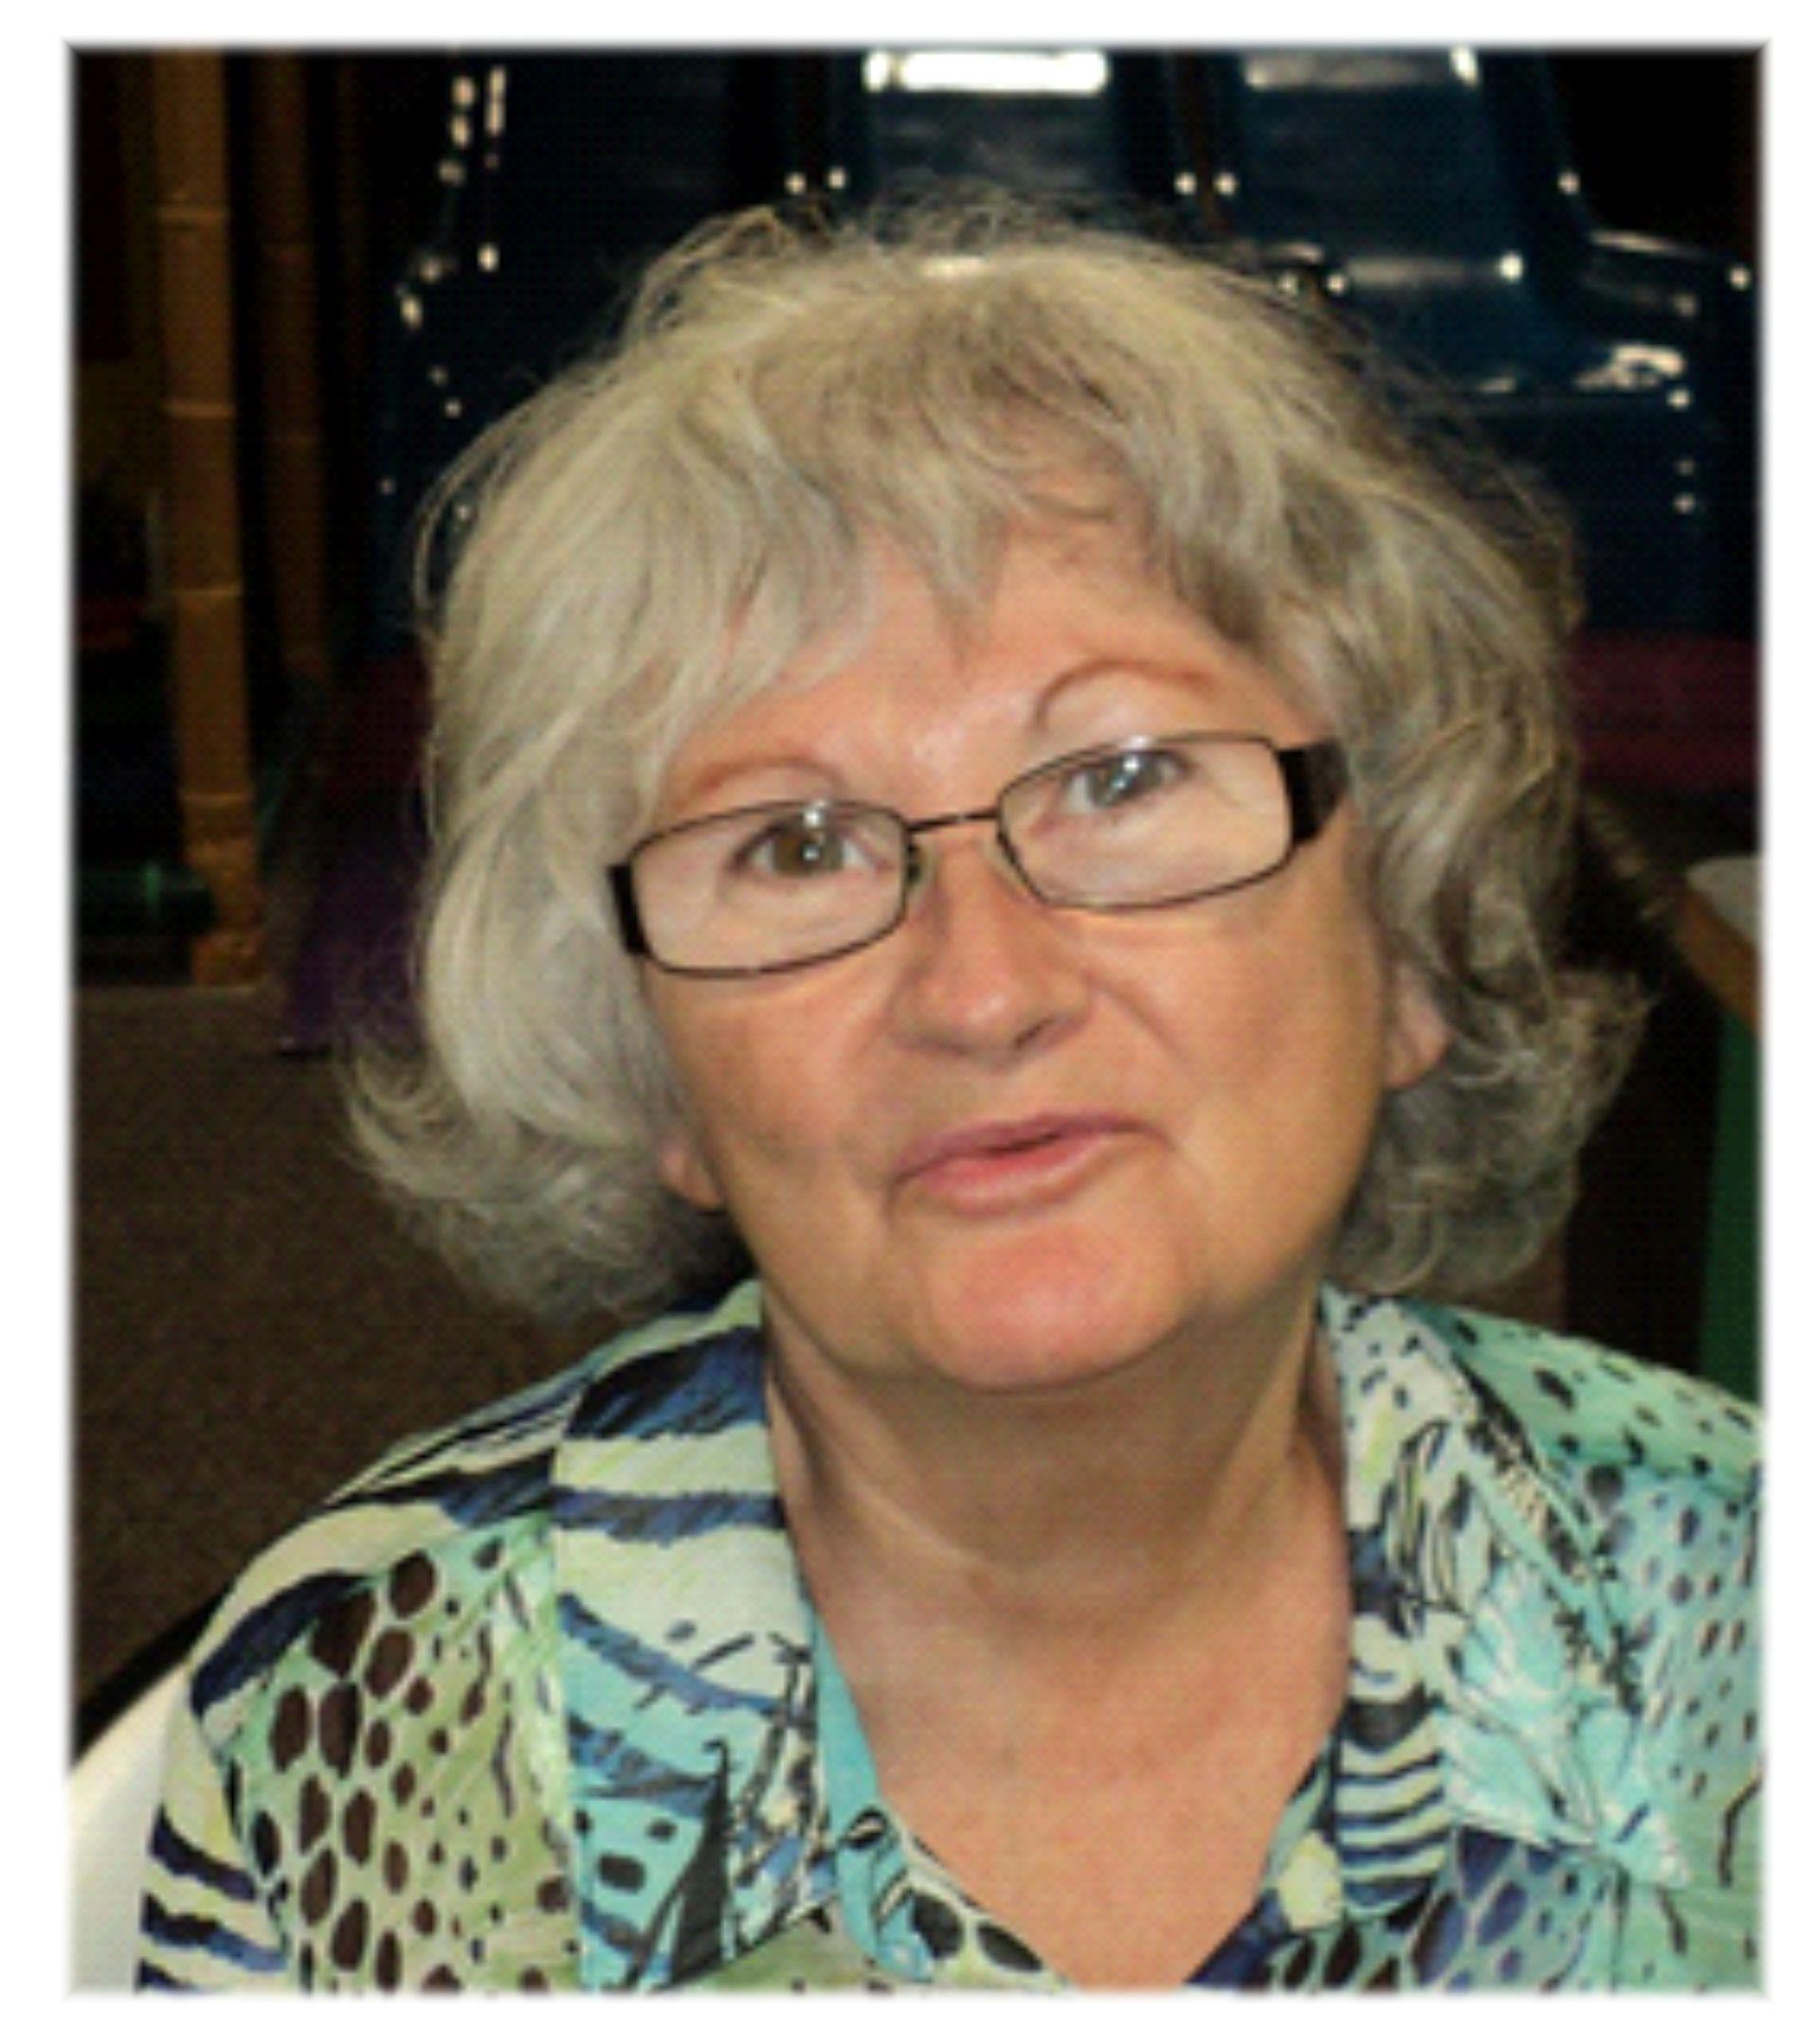 Susan M. Hergott